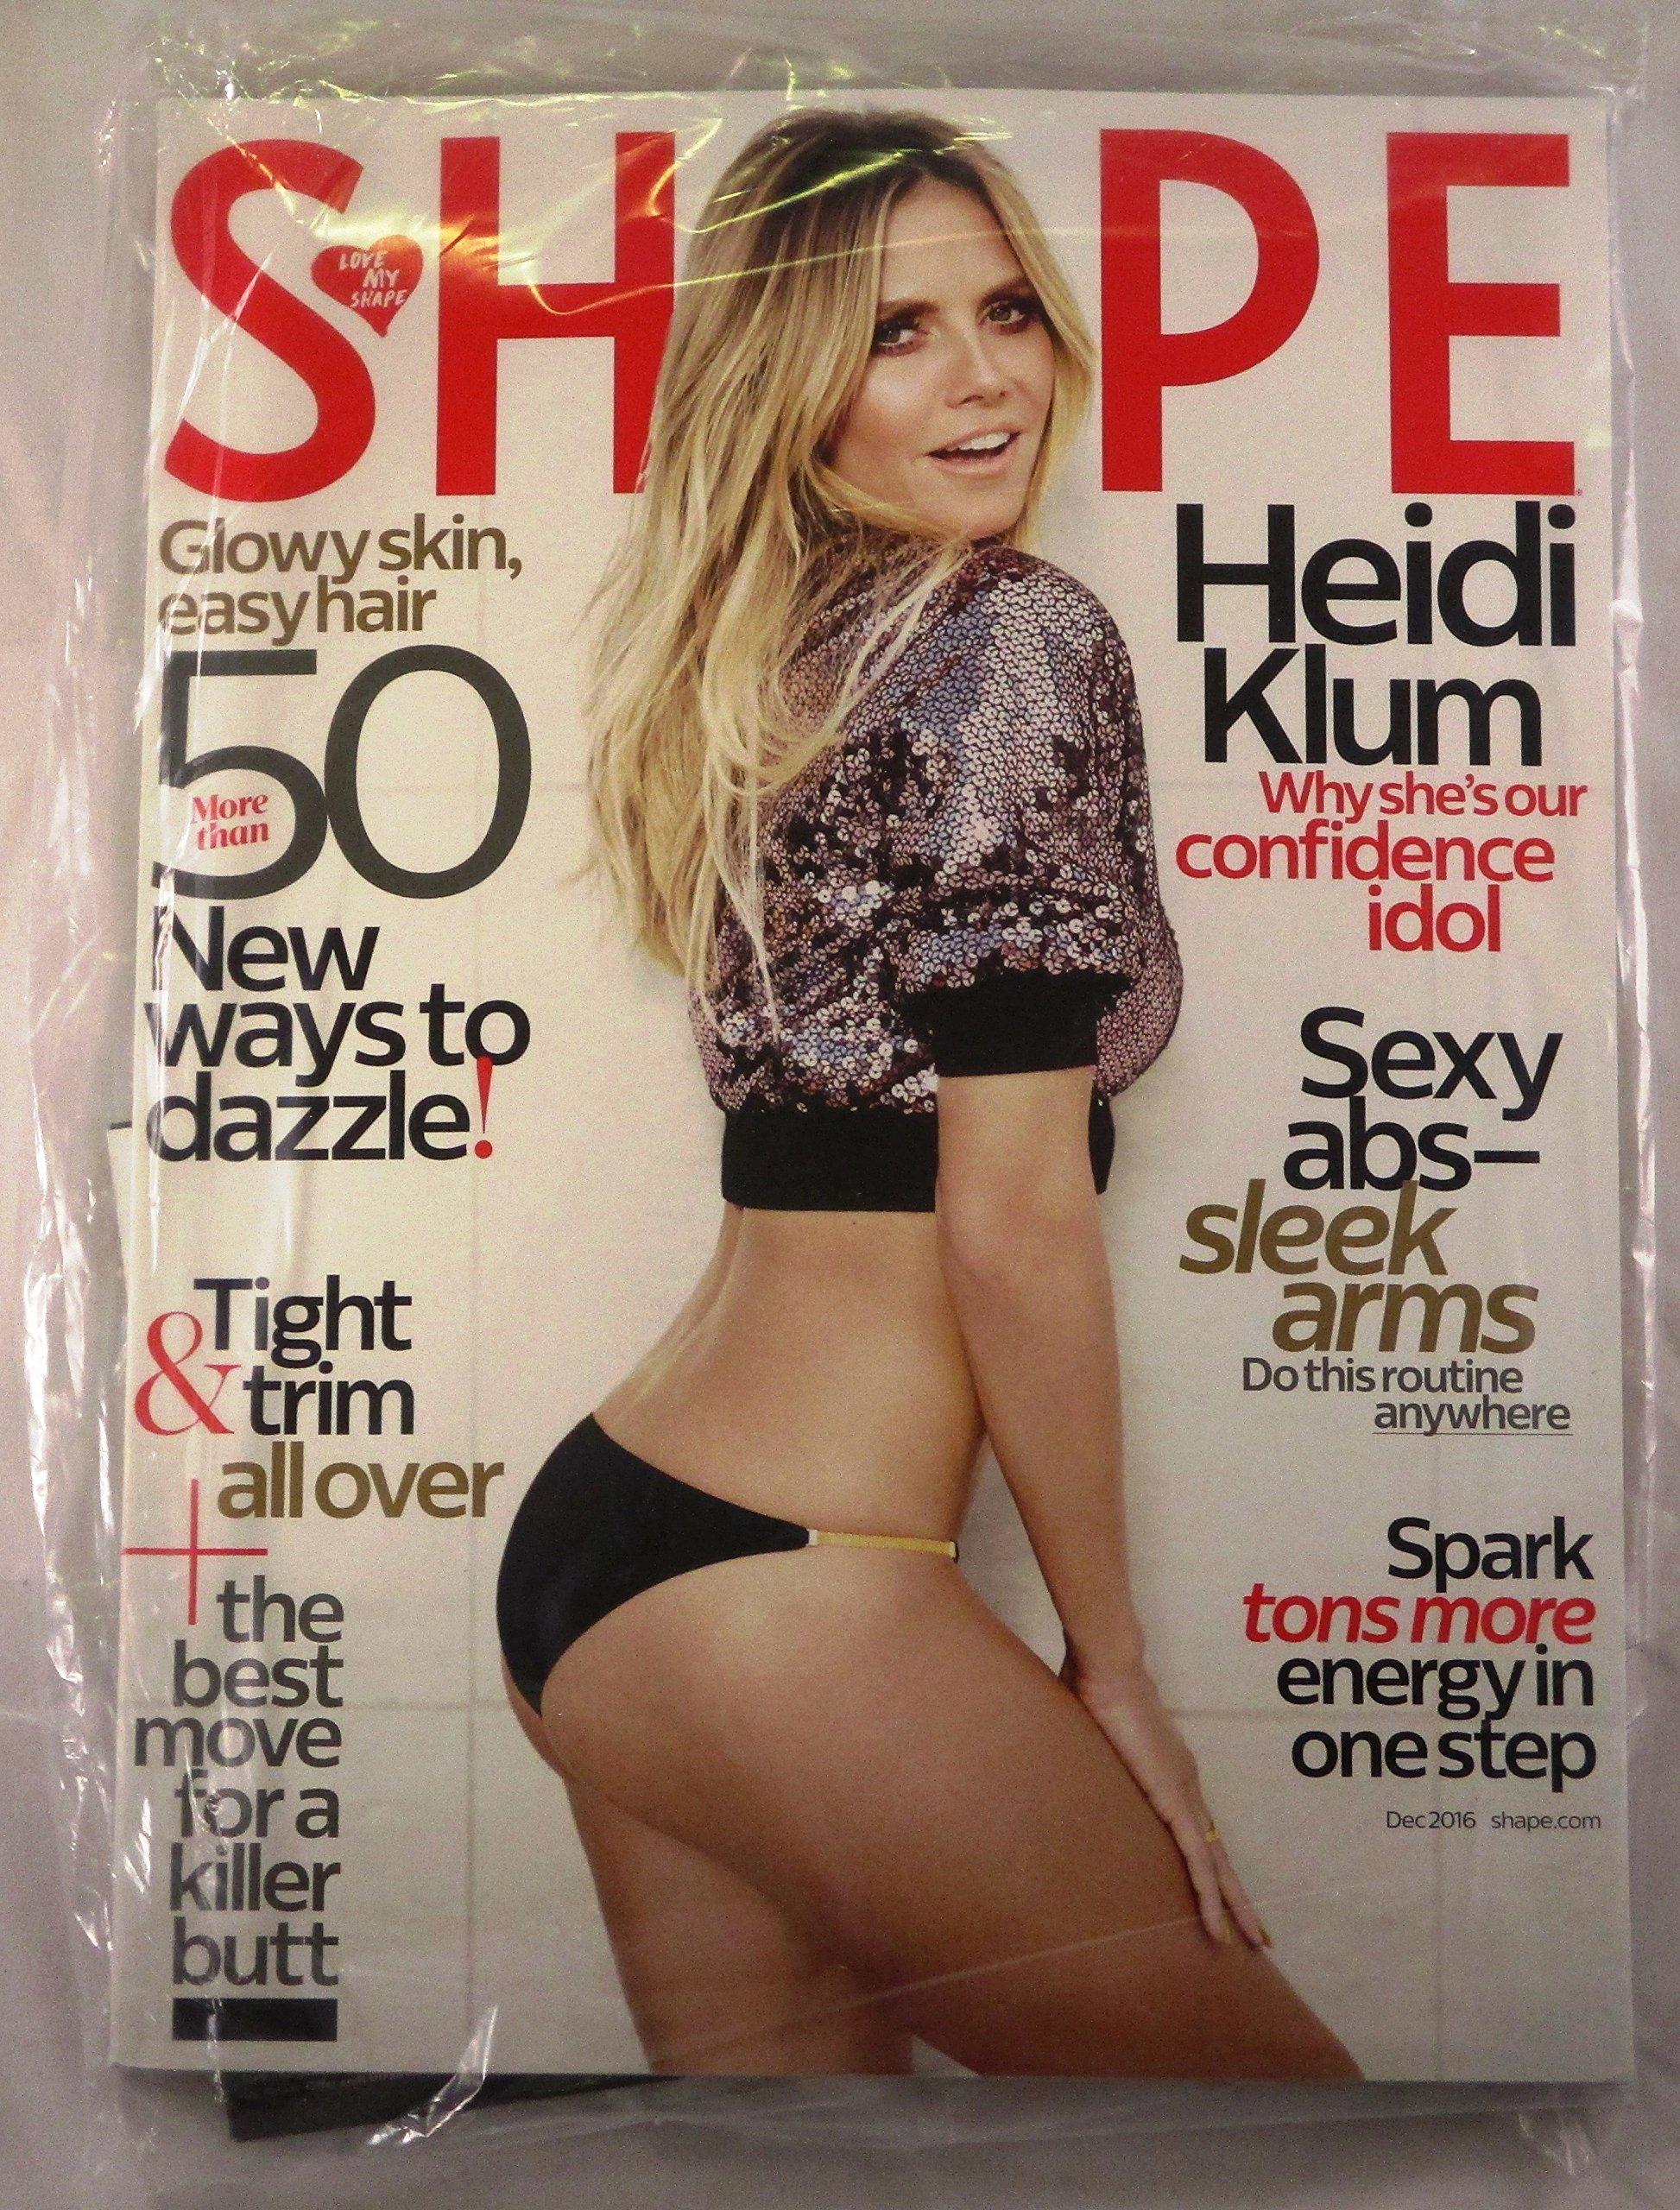 Shape magazine December 2016 { heidi klum Cover}: